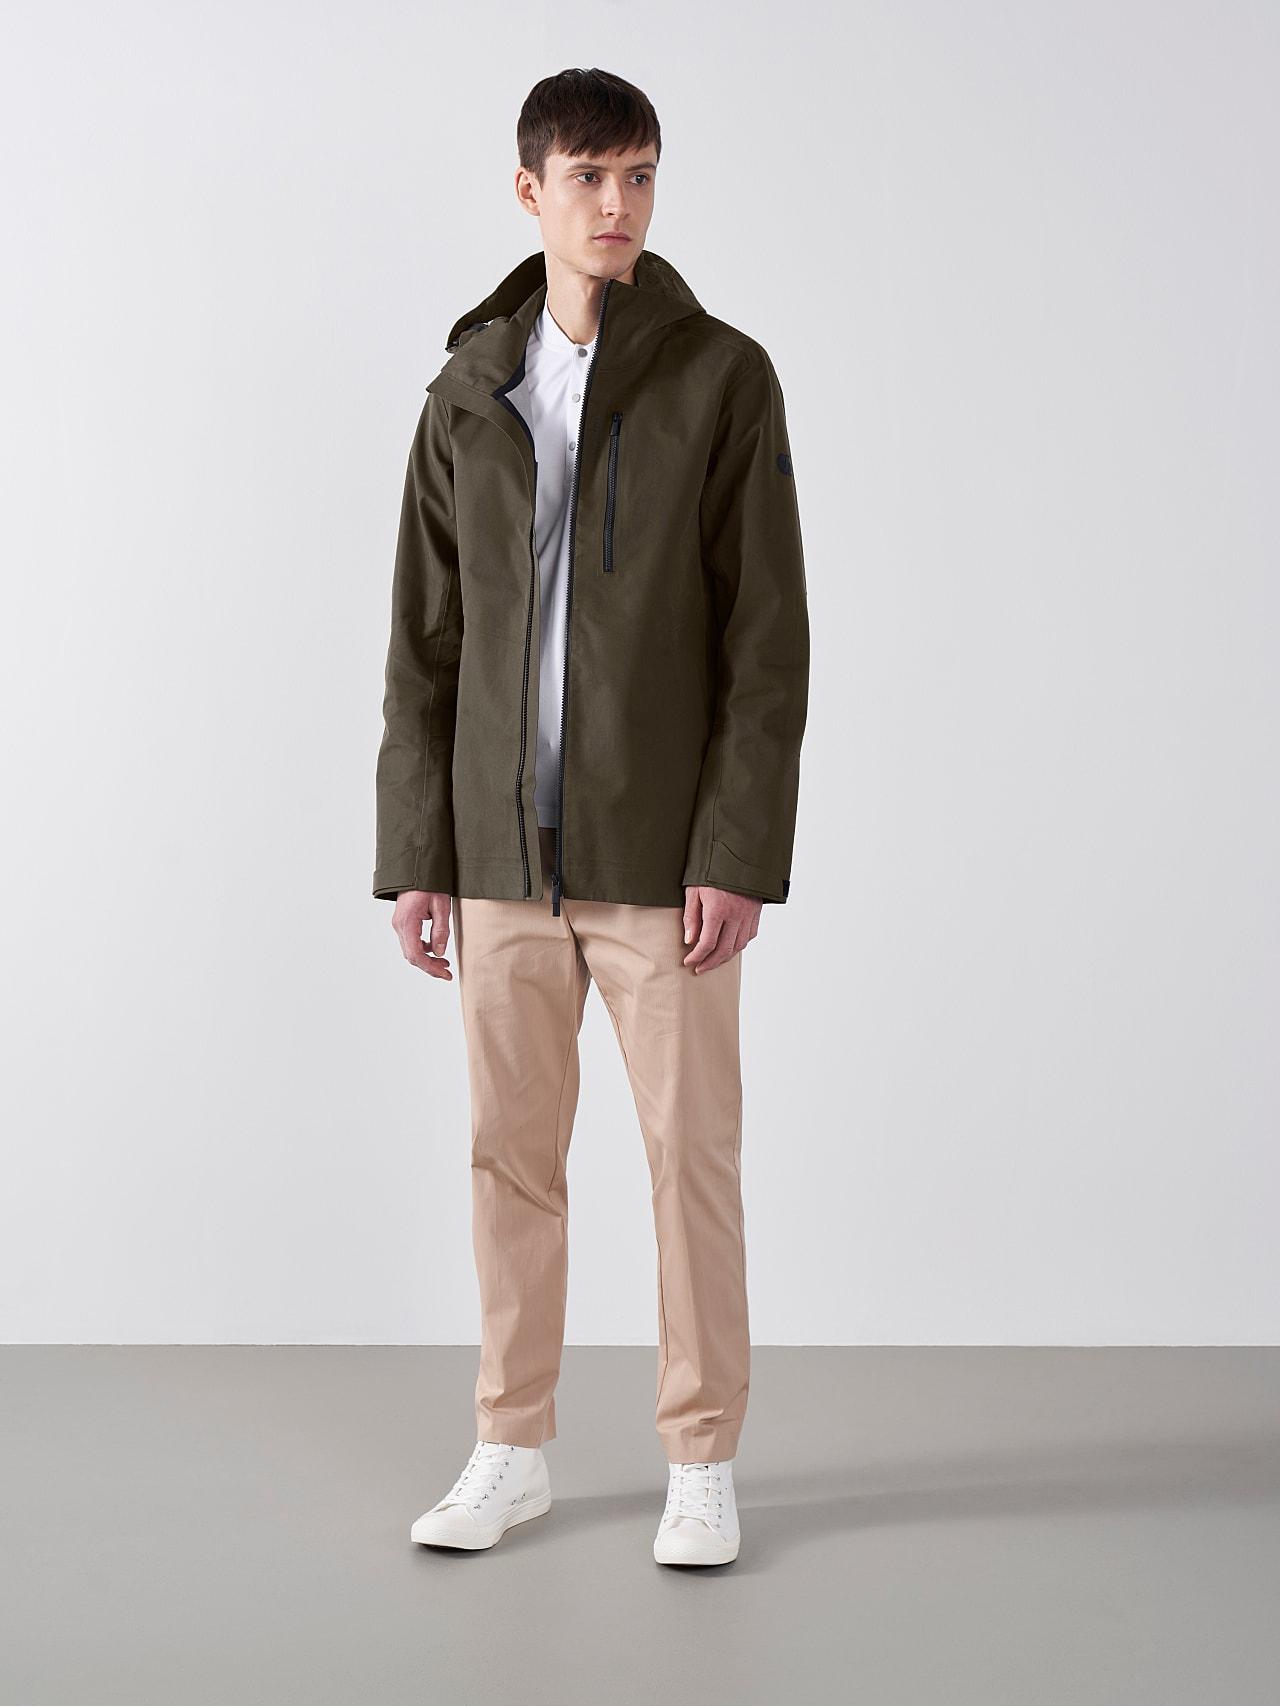 OKOVO V3.Y5.01 Packable Waterproof Jacket olive Front Alpha Tauri